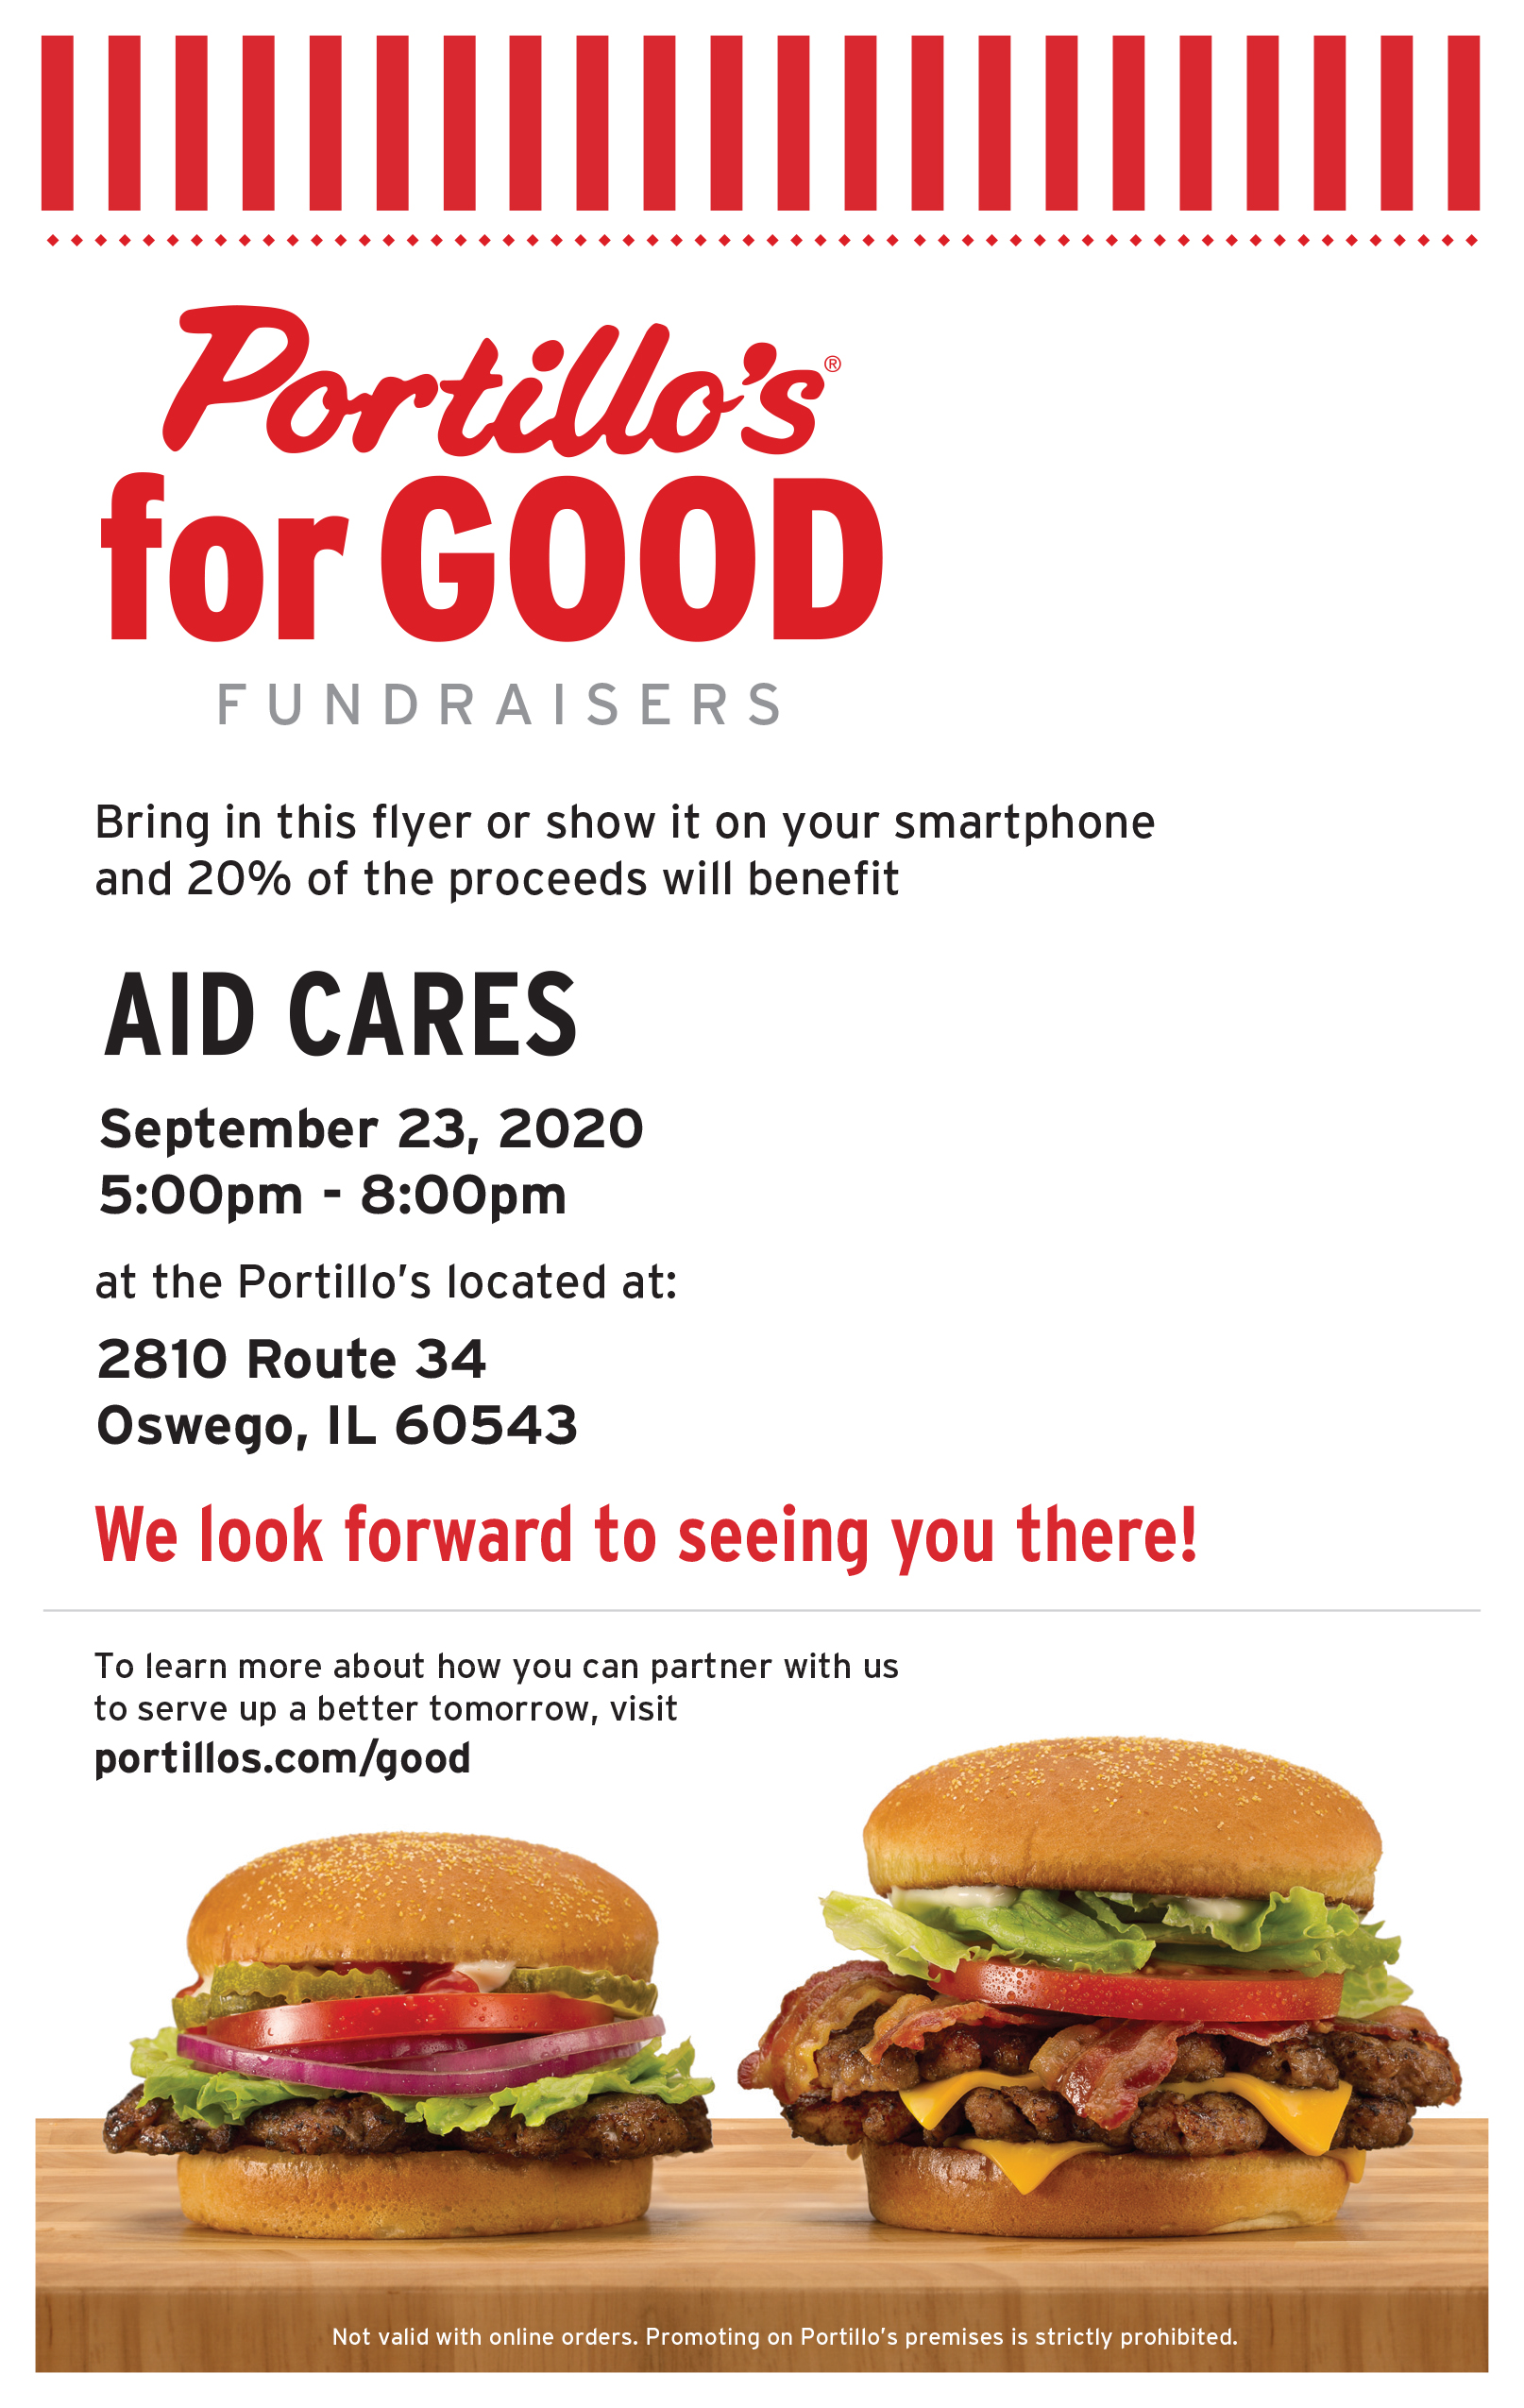 Oswego Portillos Fundraiser Flyer